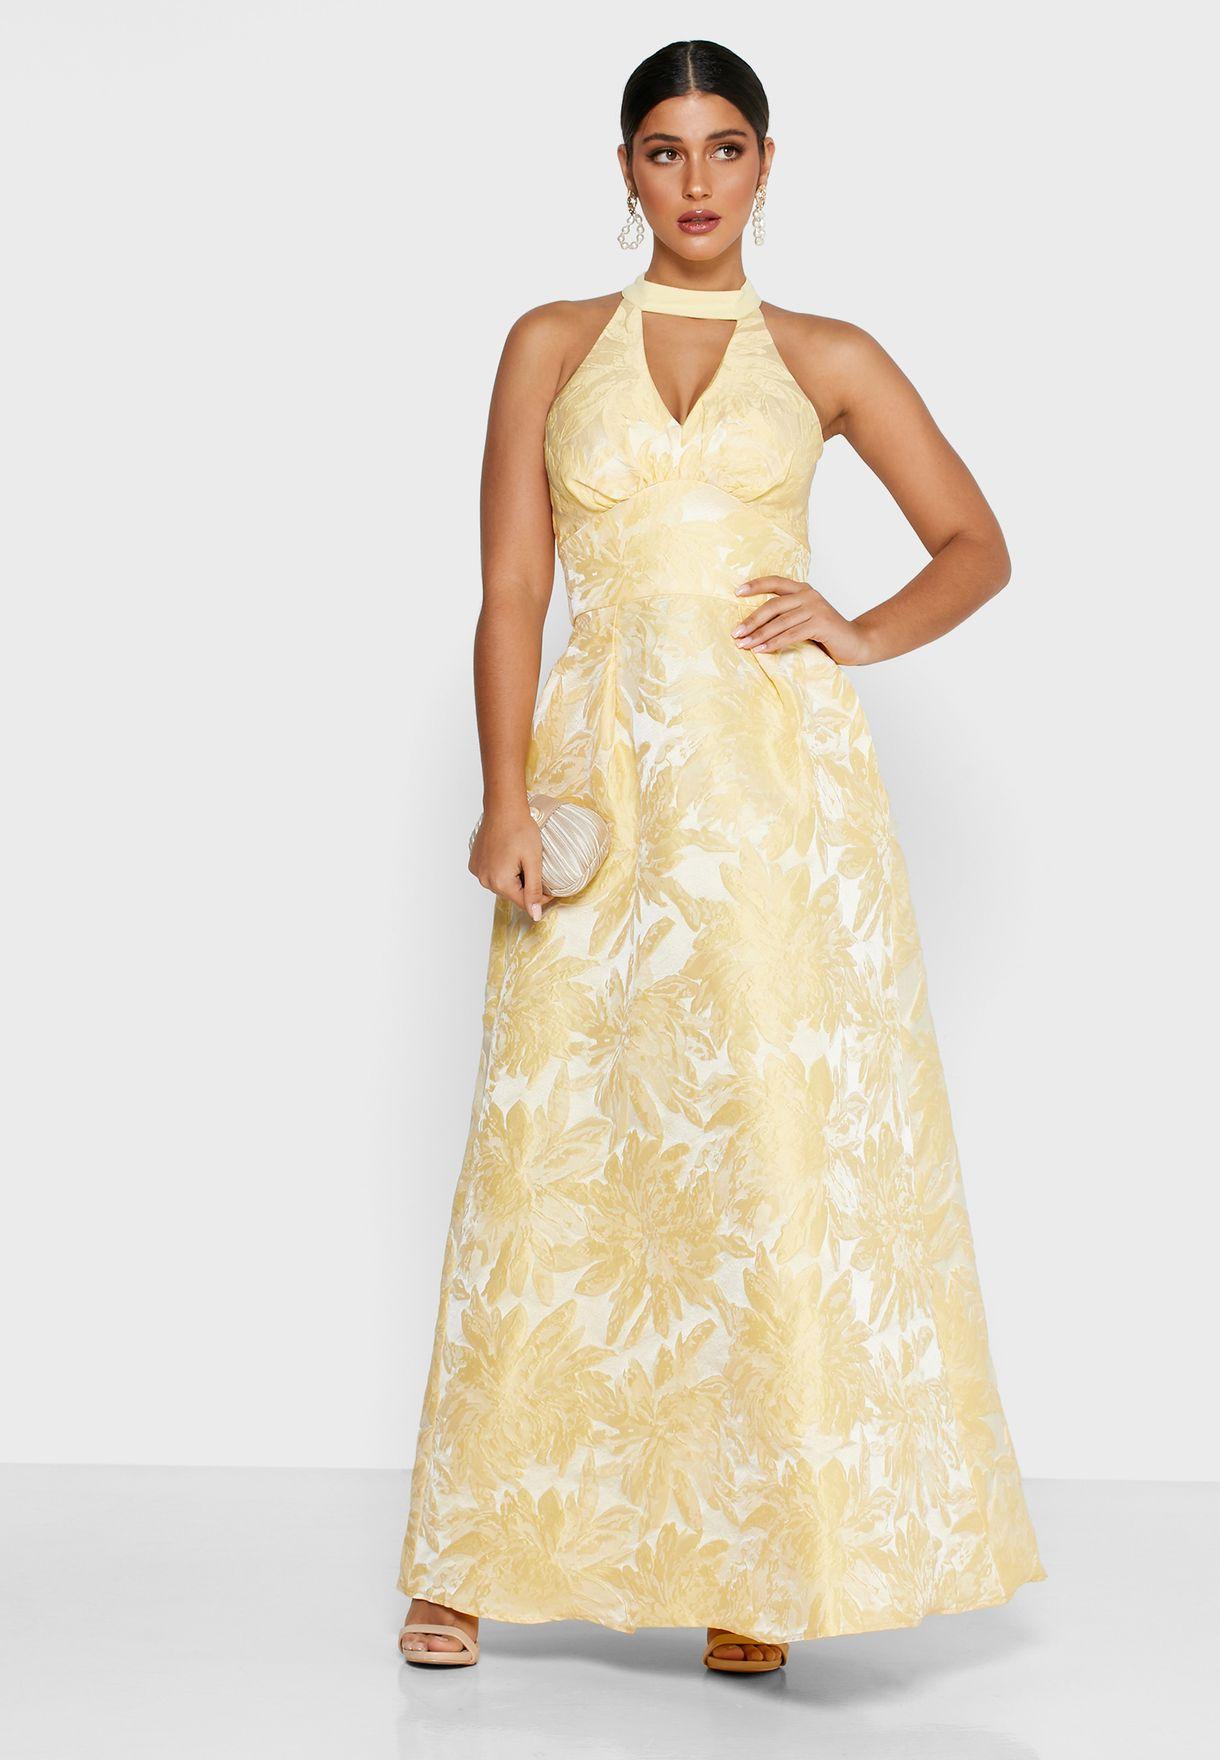 Choker Neck Jacquard Dress